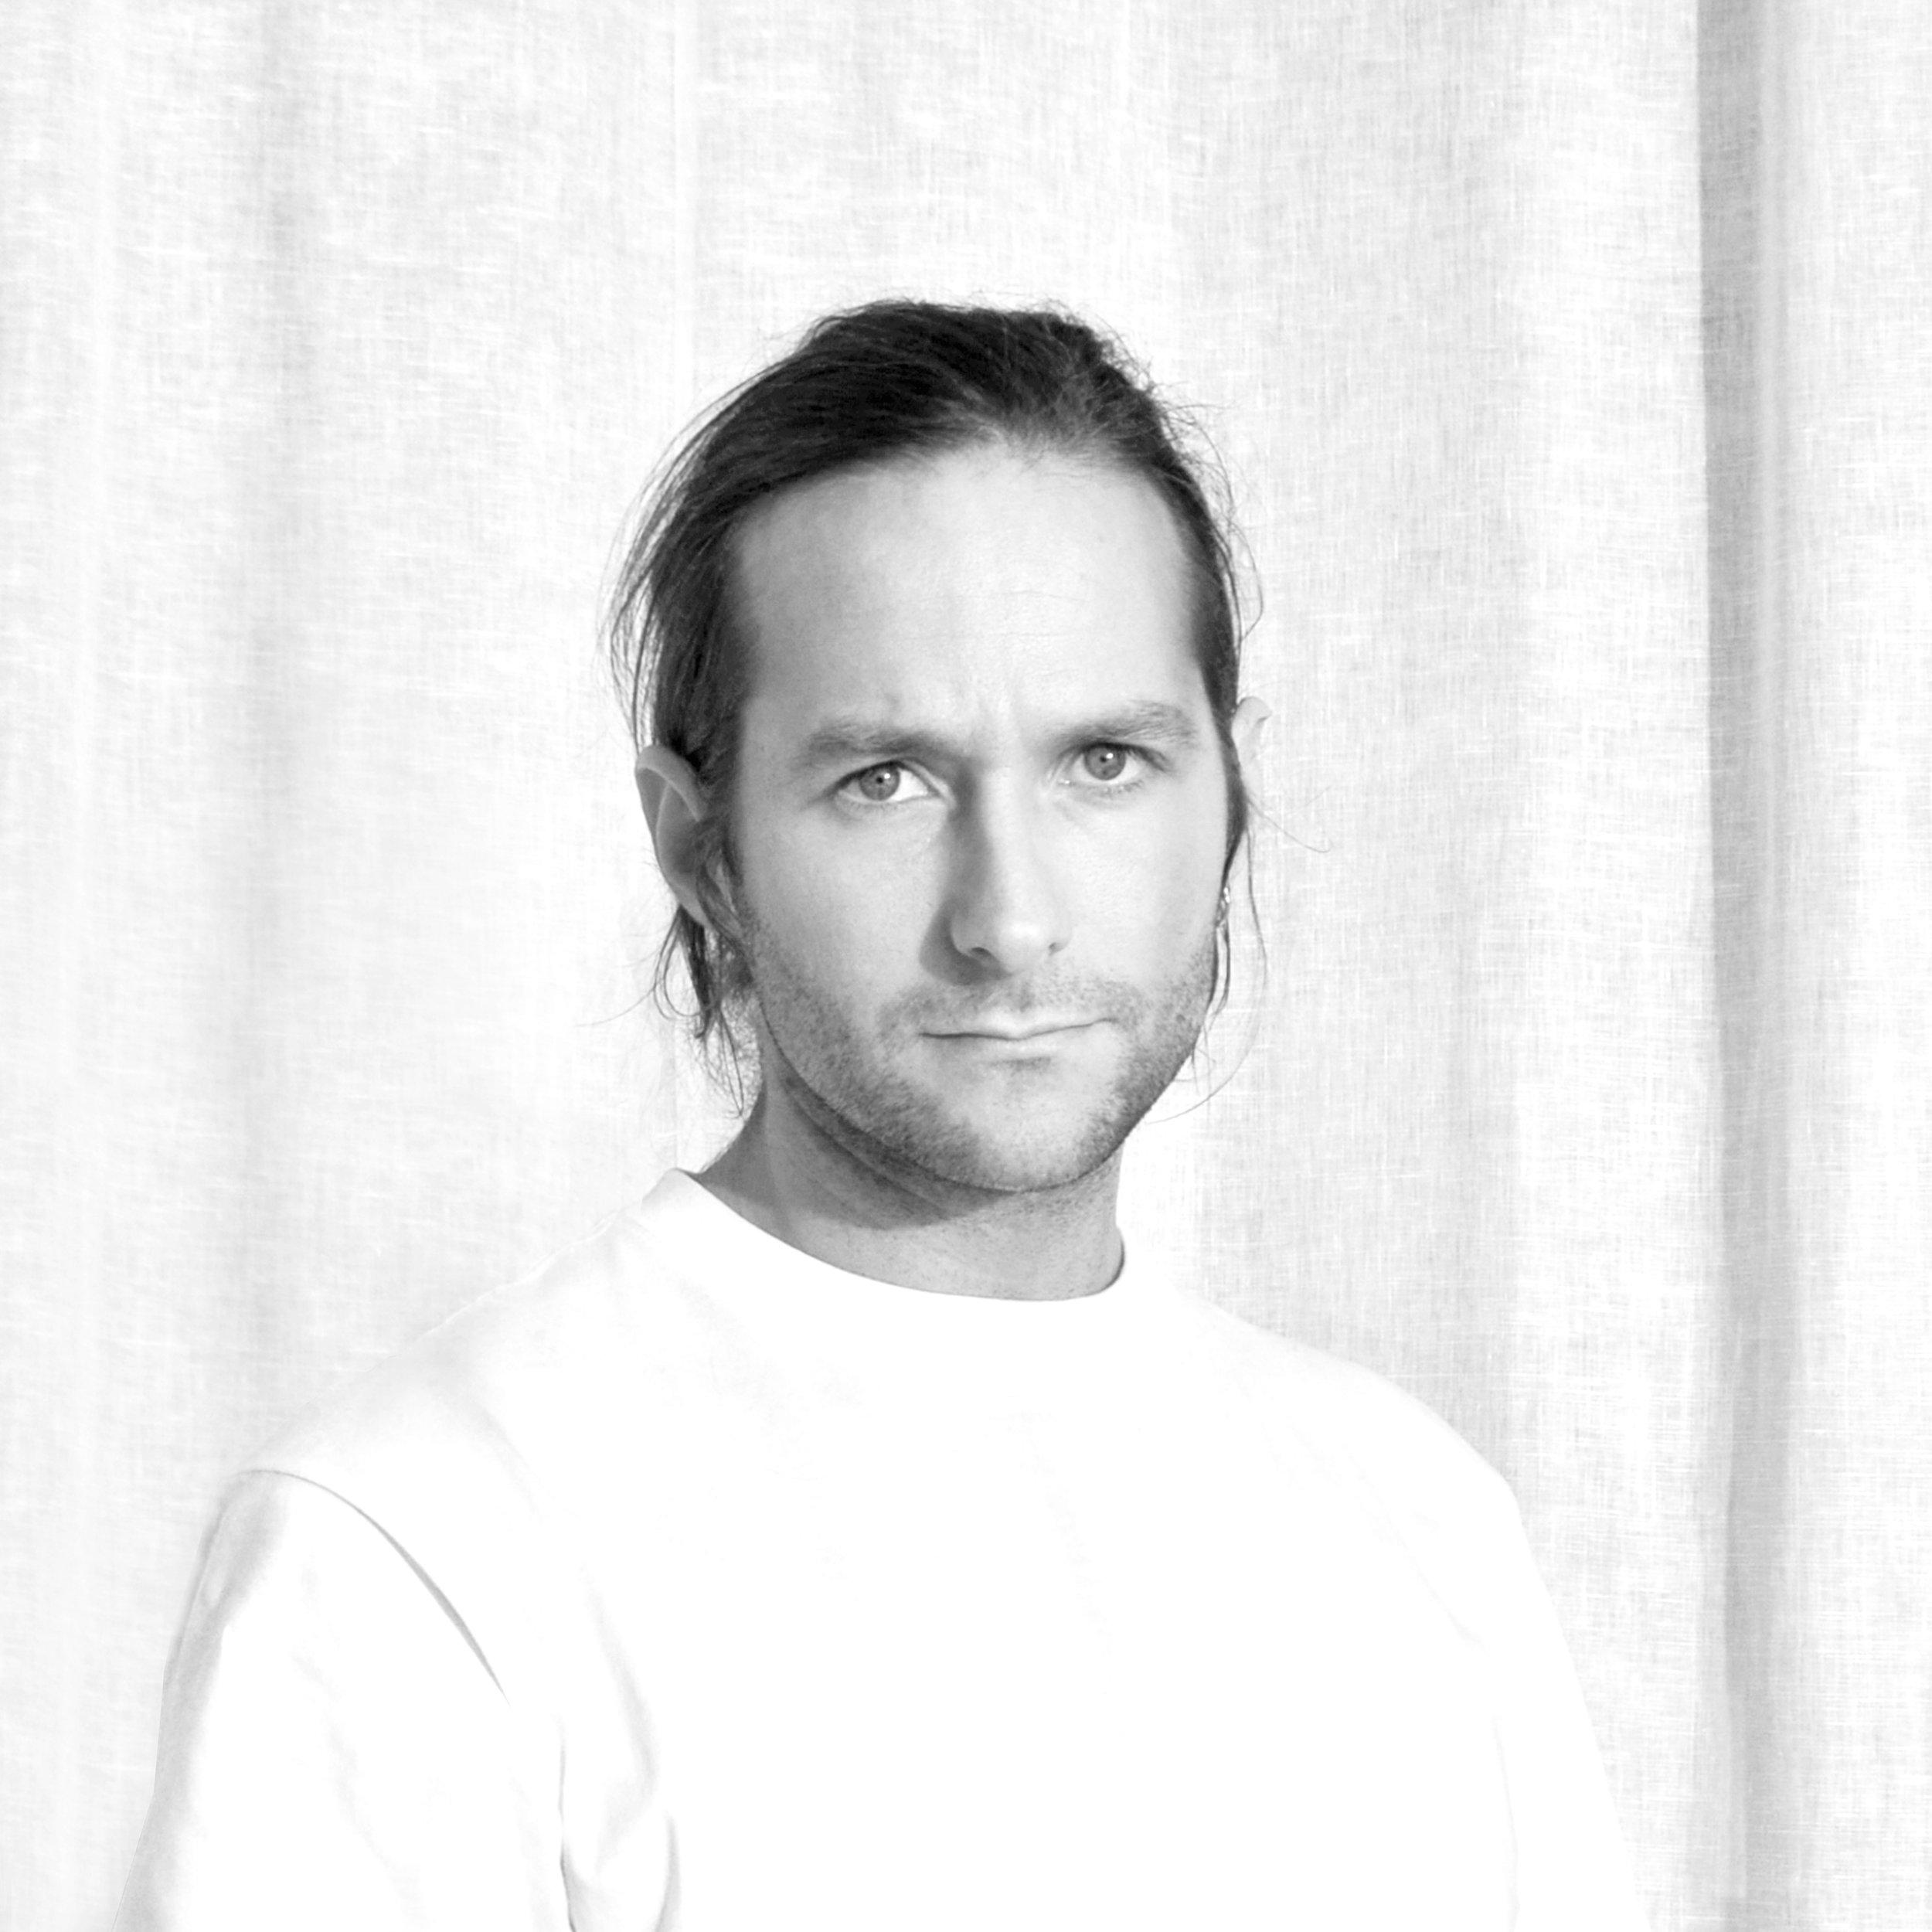 Jakob Wiklander Arkitekt SAR/MSA m +46 076 400 69 86 jakob@spridd.se